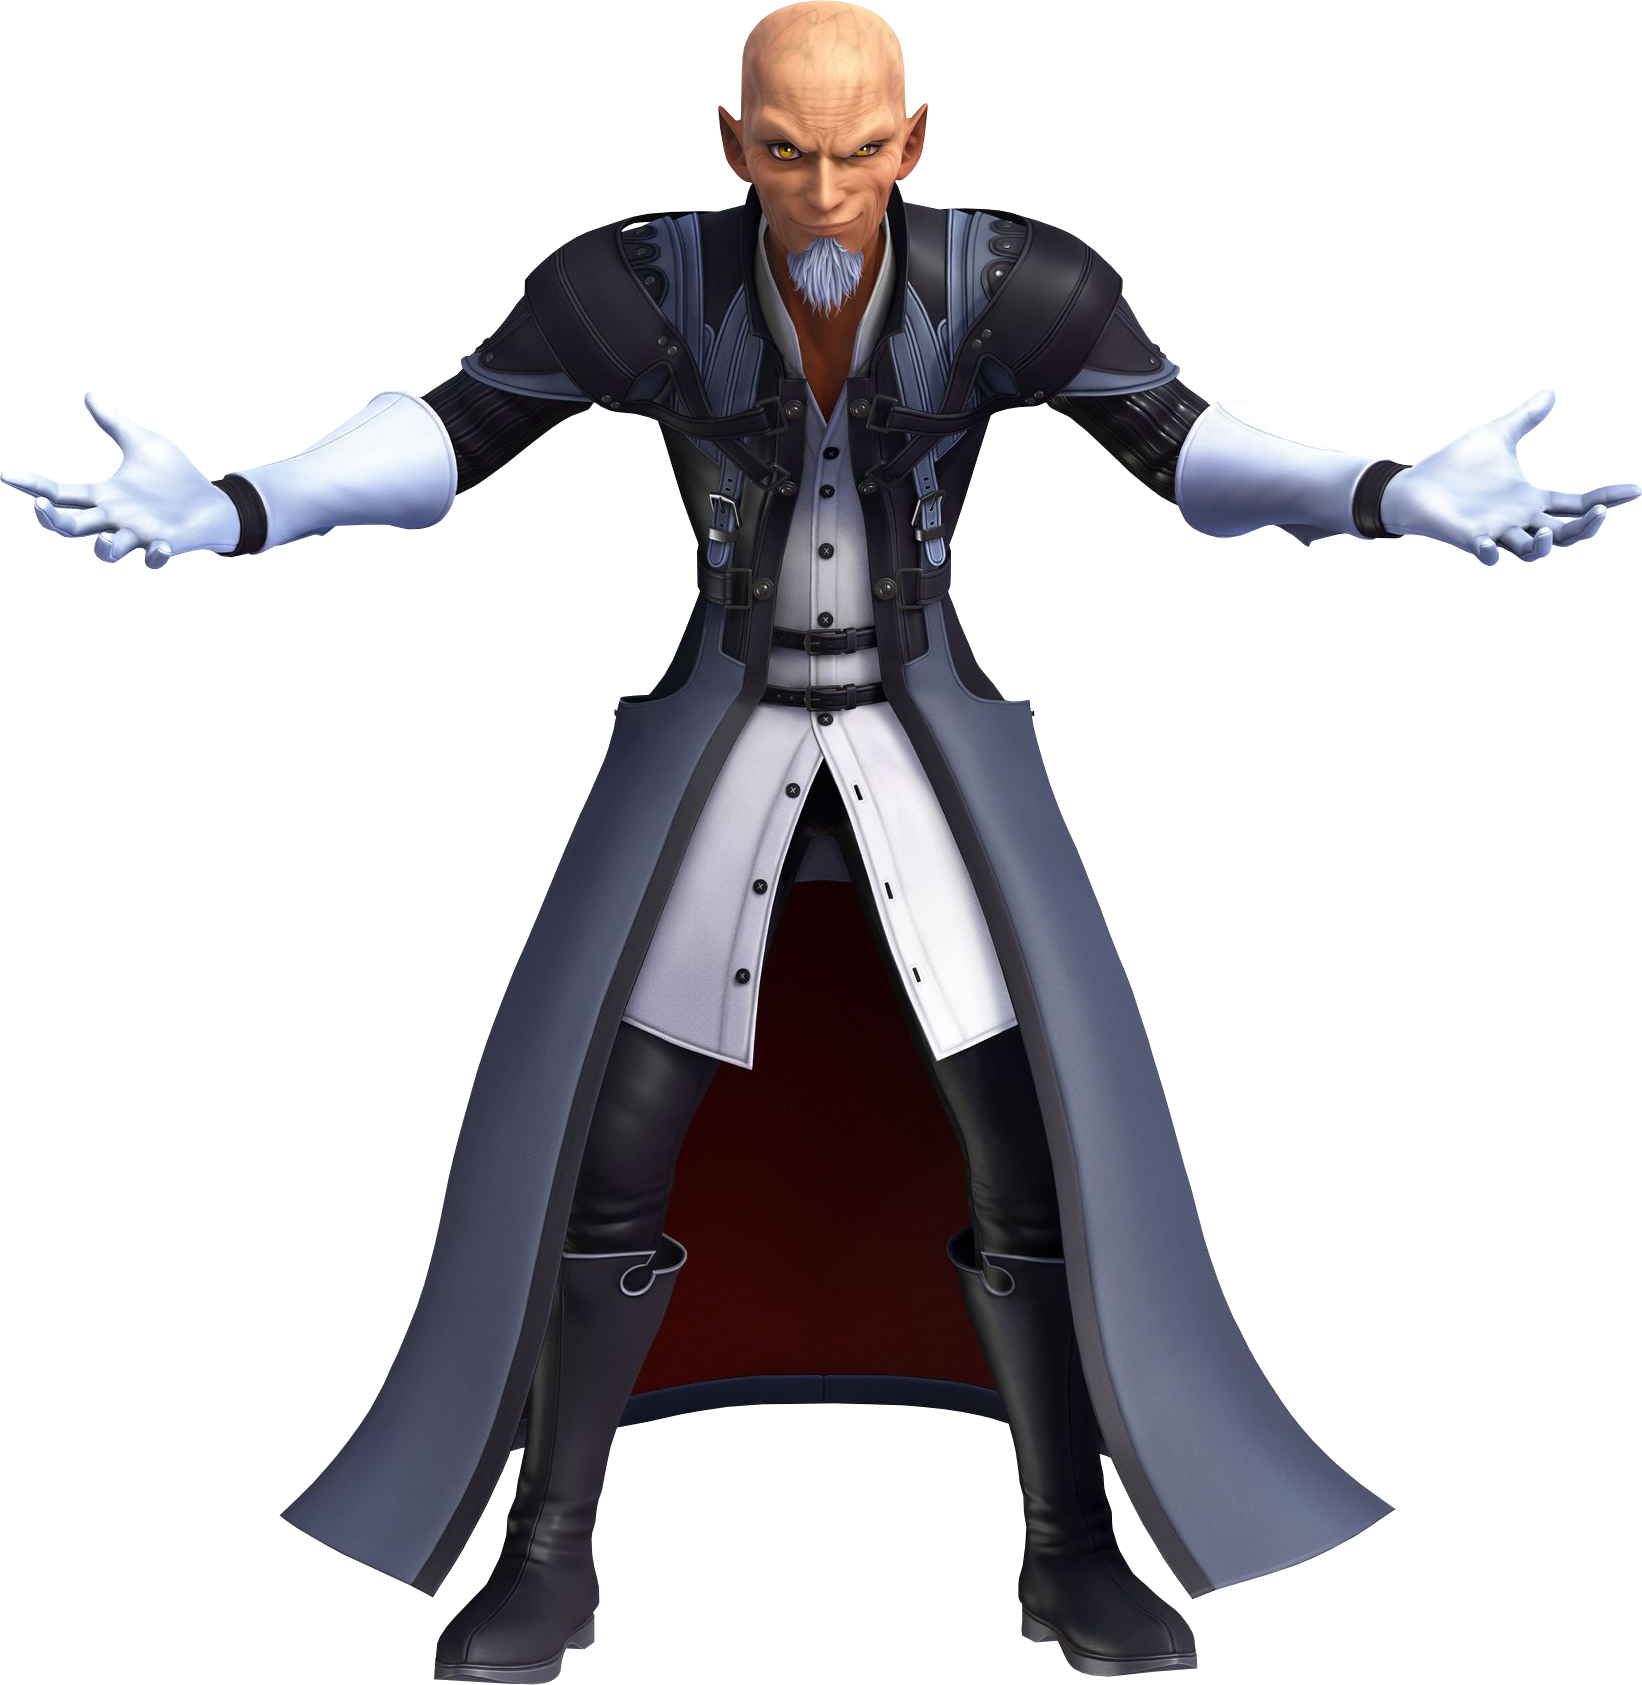 Master Xehanort | Villains Wiki | FANDOM powered by Wikia